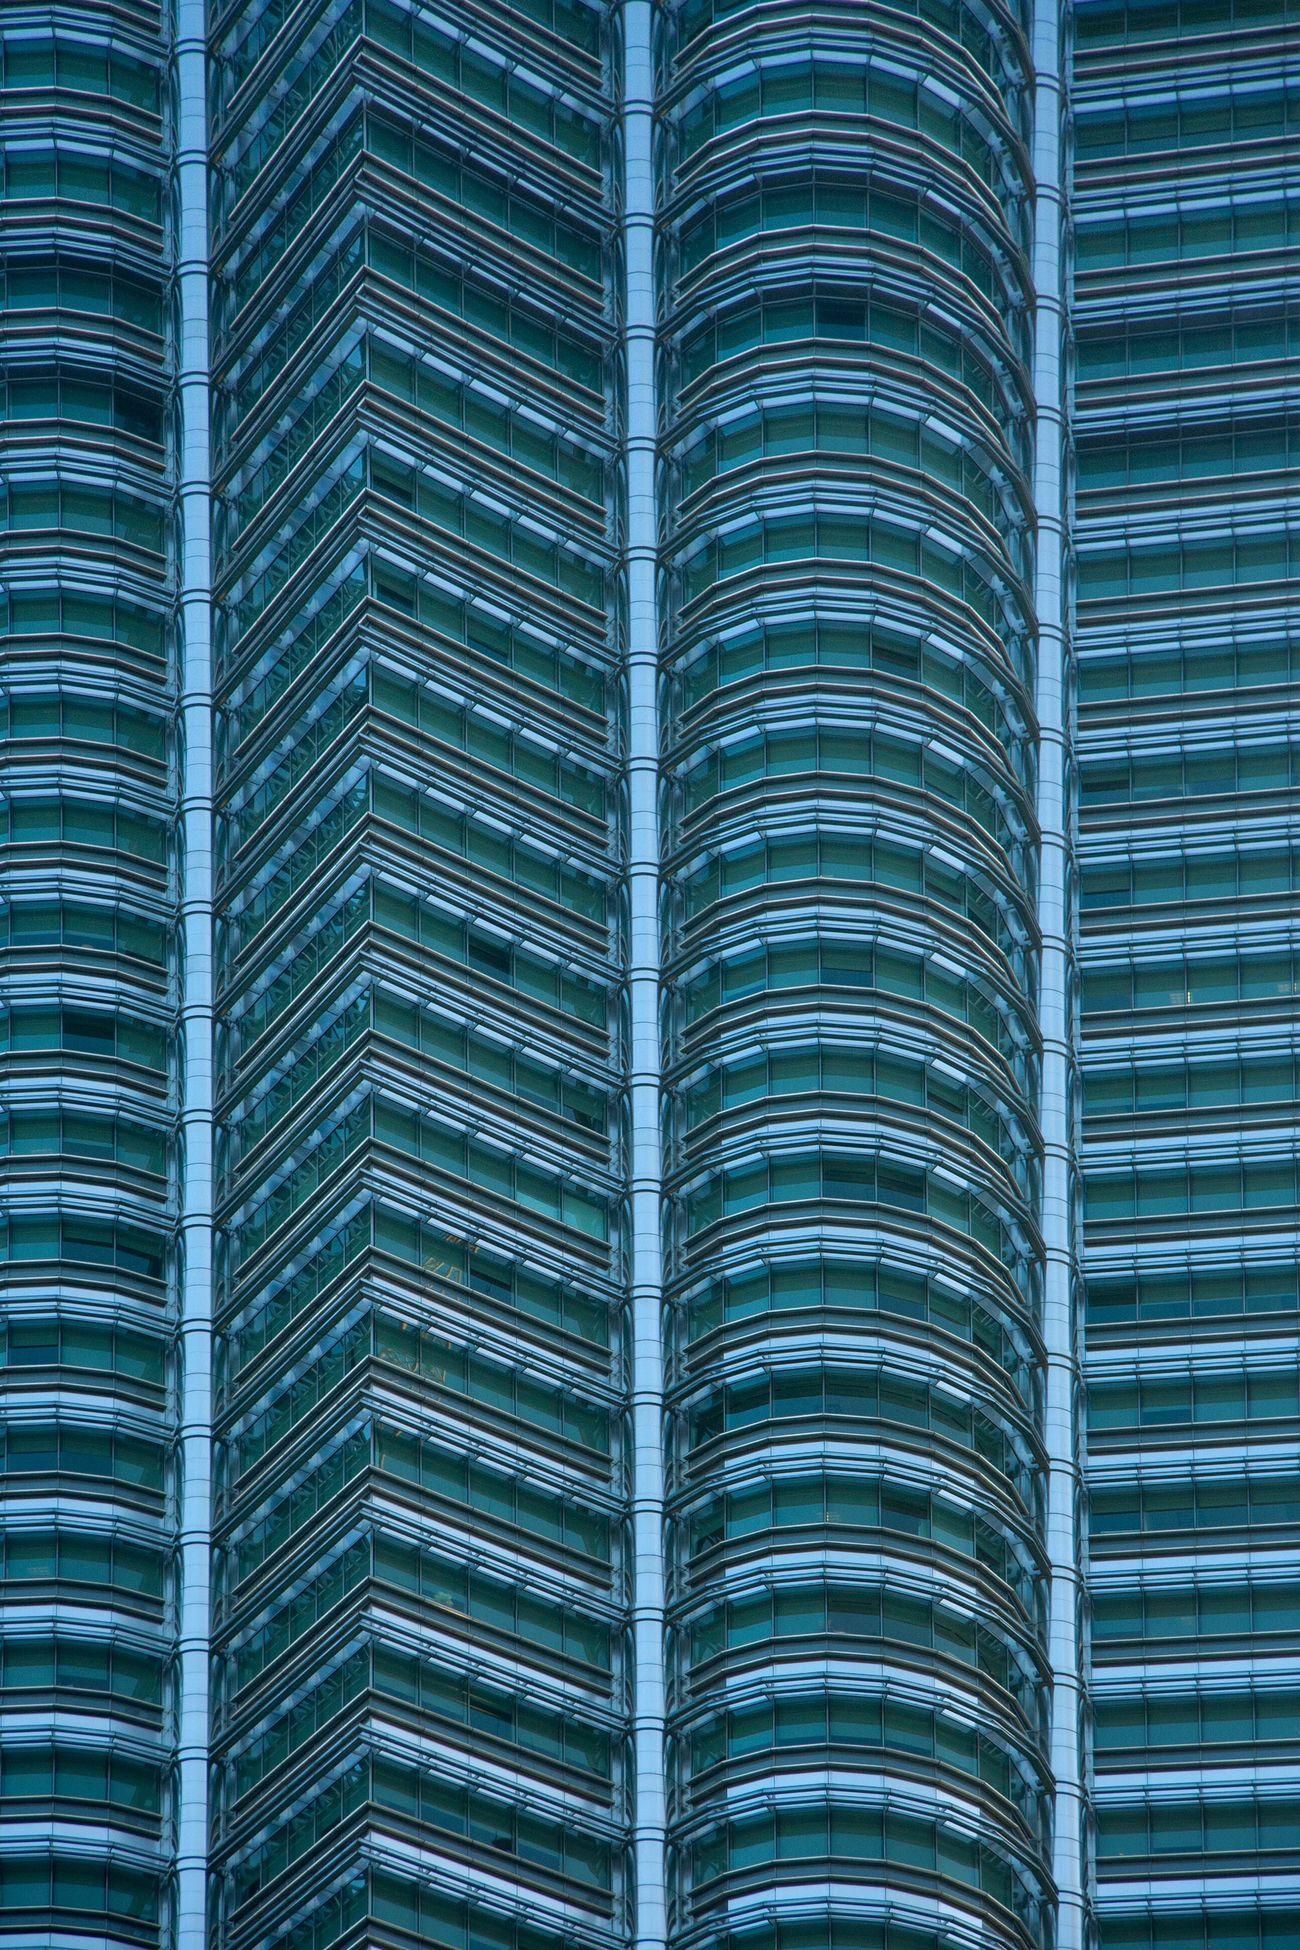 Skyscraper Architecture Pattern Blue Tower The Architect - 2017 EyeEm Awards